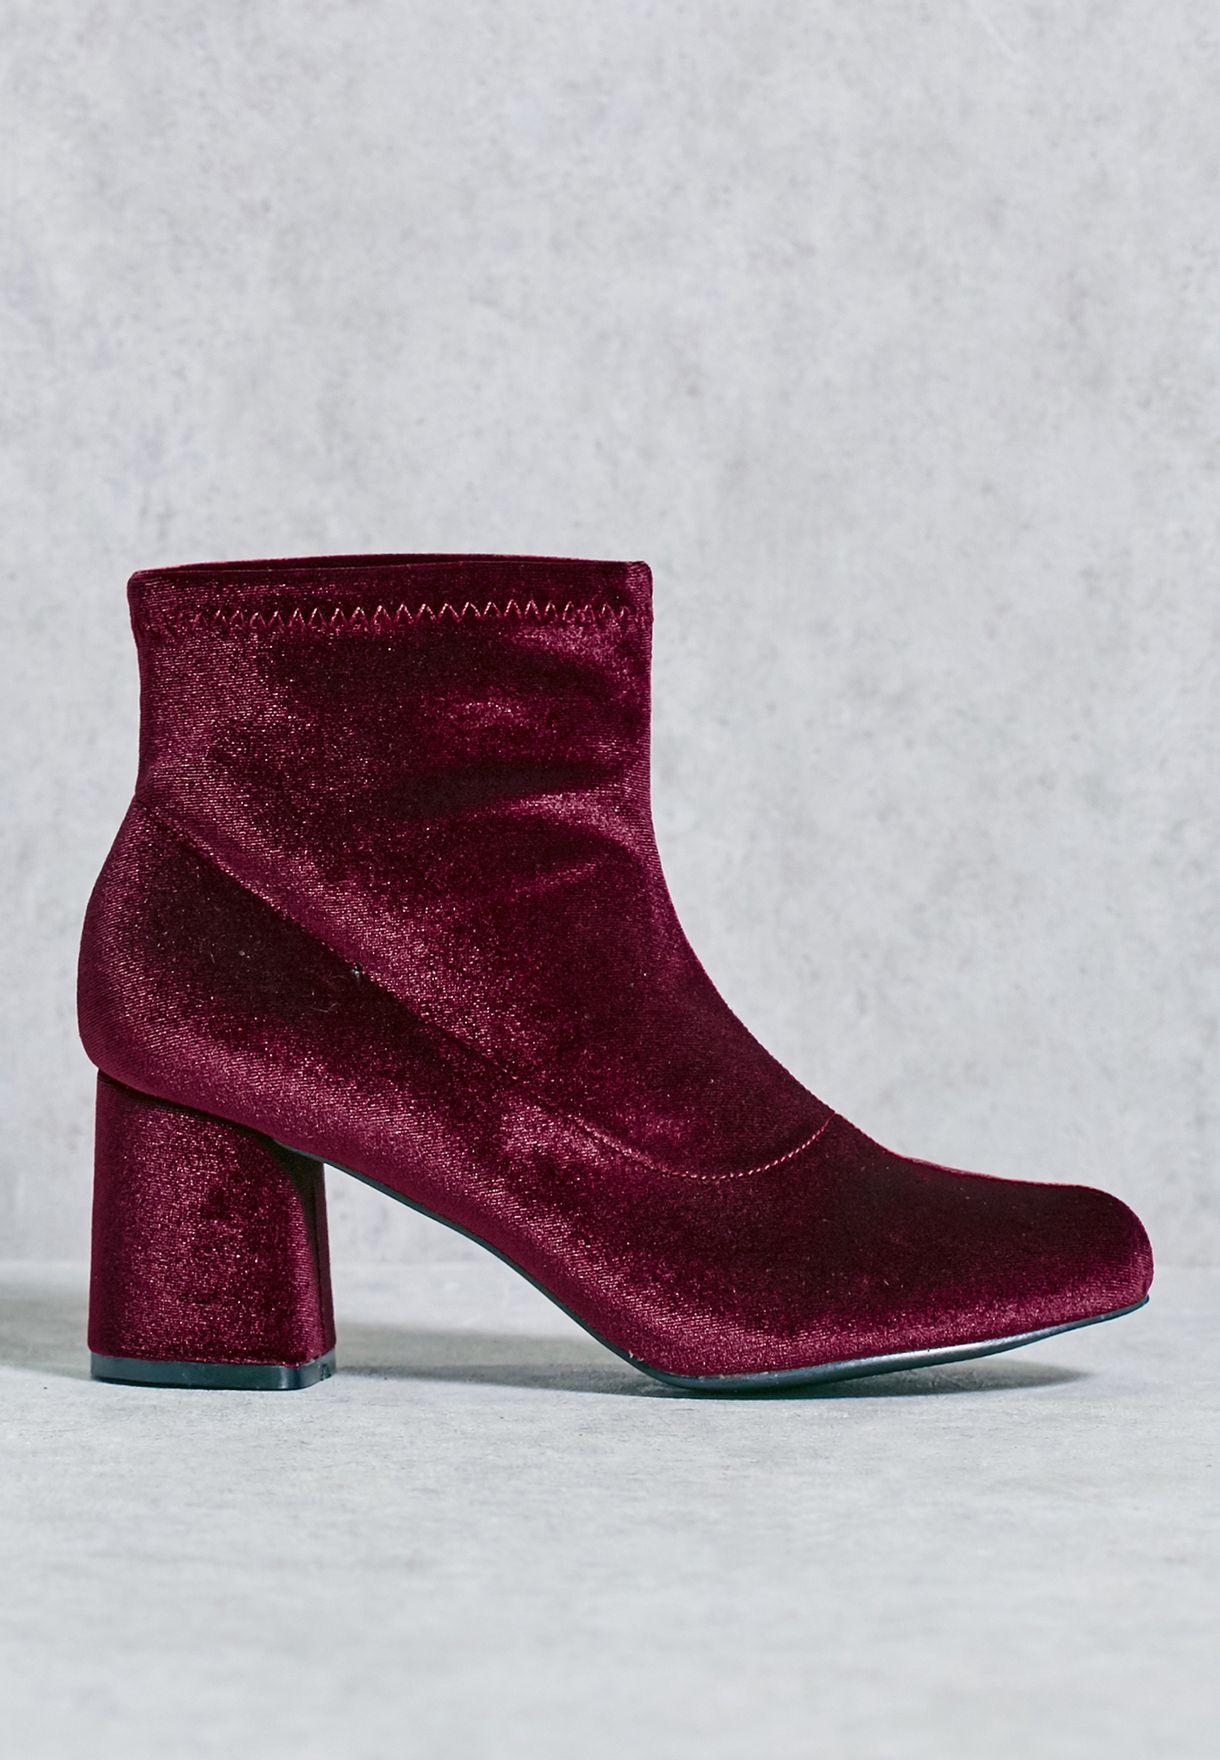 83ee7bd3fc2 Shop Truffle purple Velvet Block Heel Boot TRINY16 for Women in ...